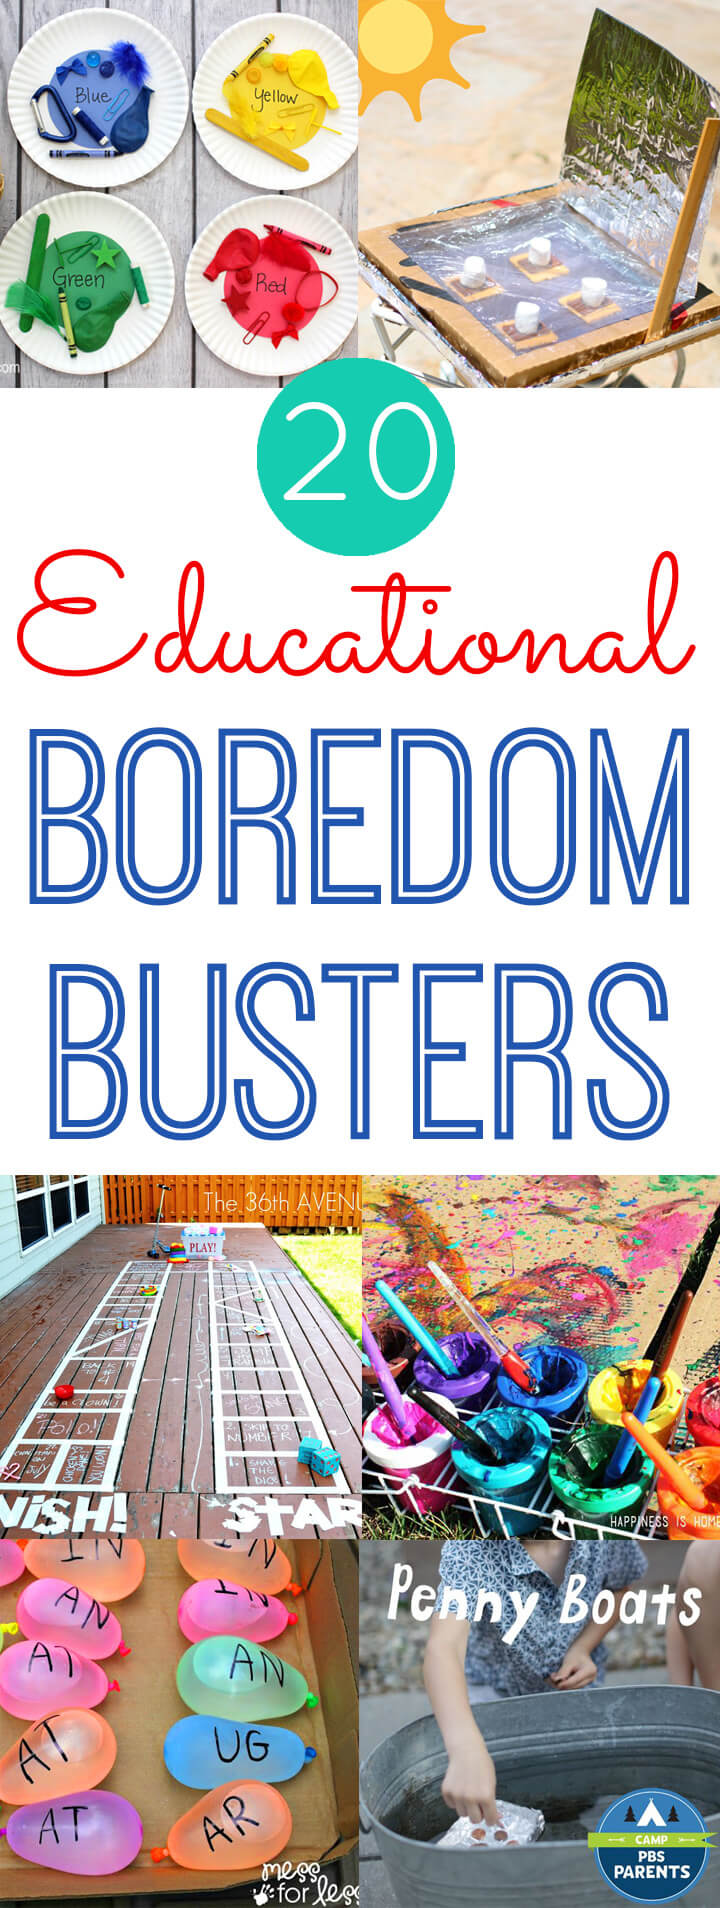 20 Educational Boredom Busters